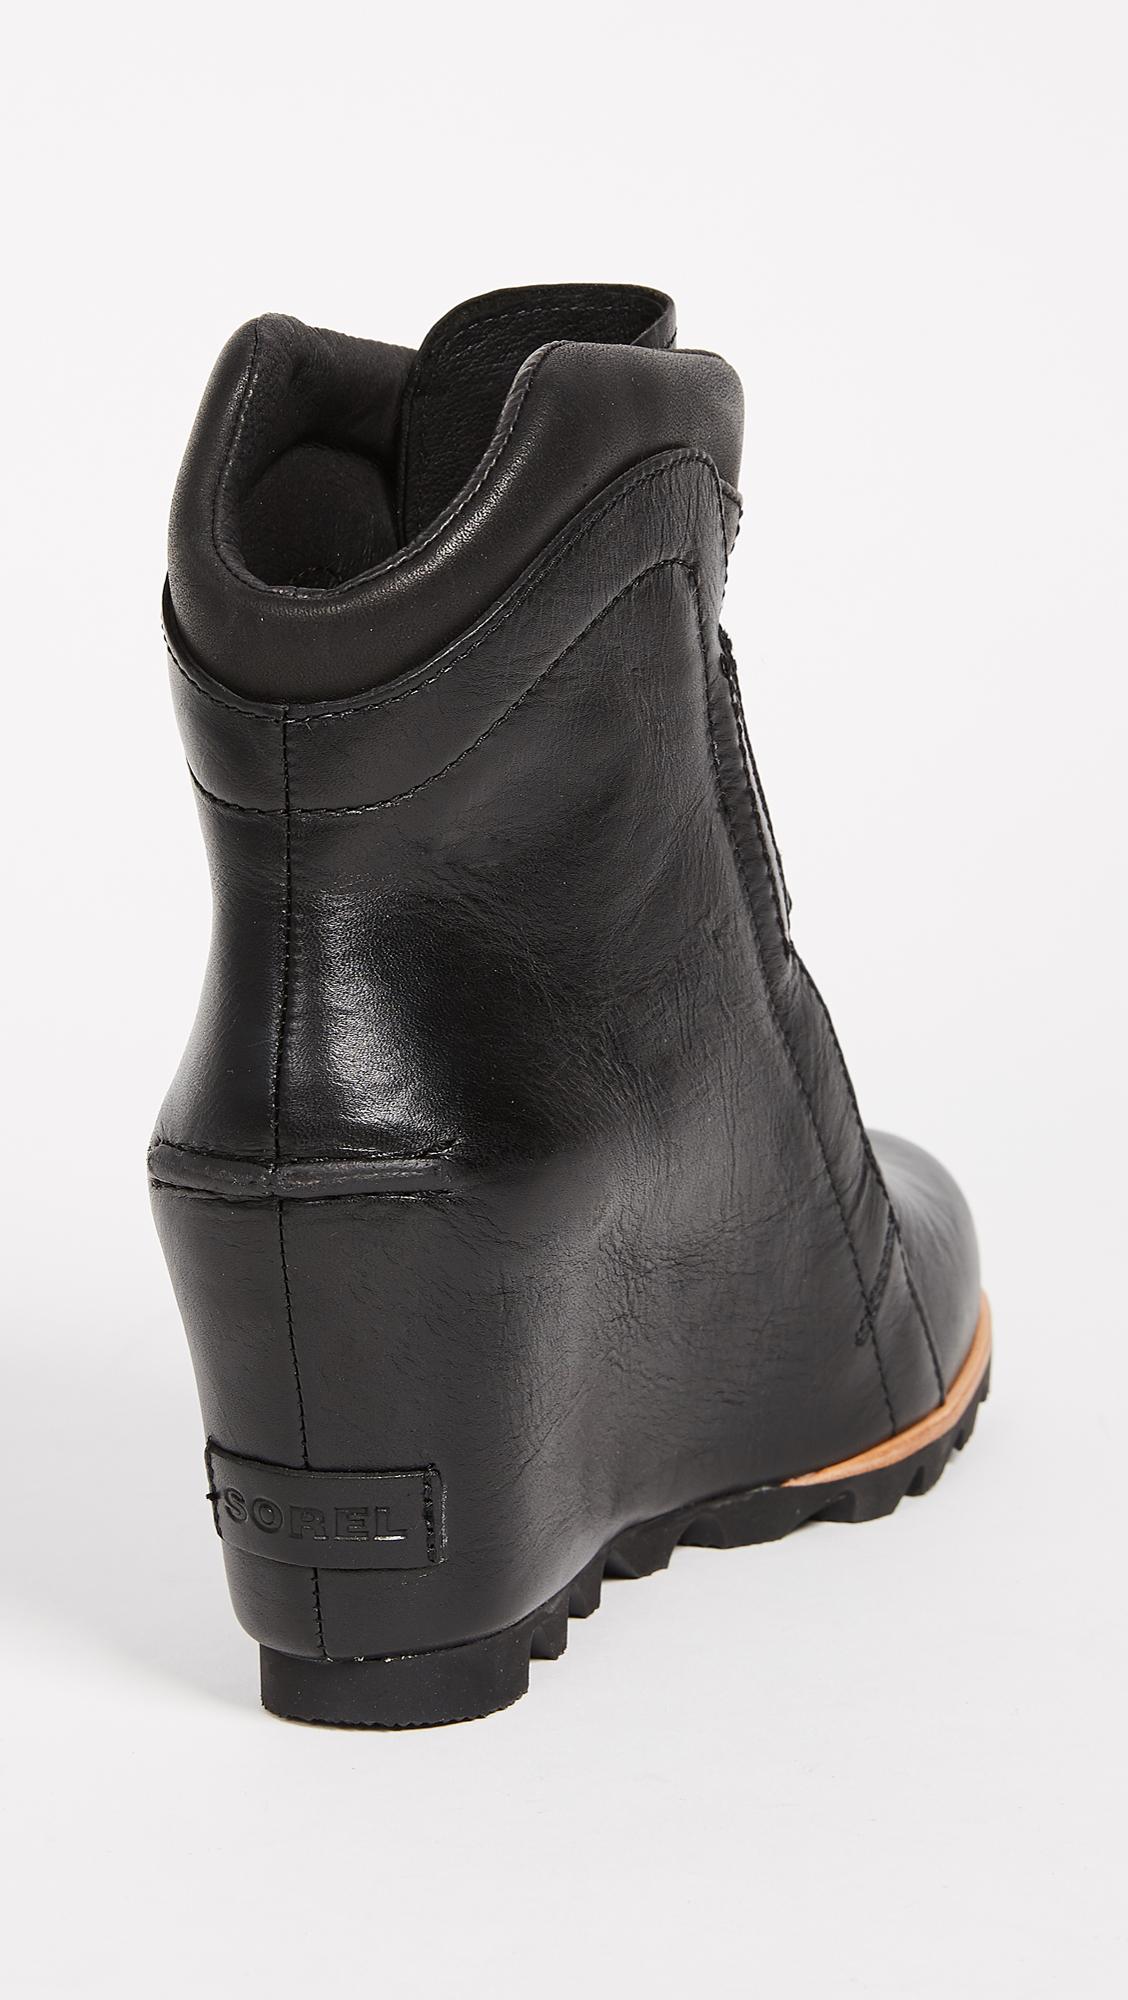 Sorel Conquest Wedge Black, Dark Grey 37 EU (6 US / 4 UK)